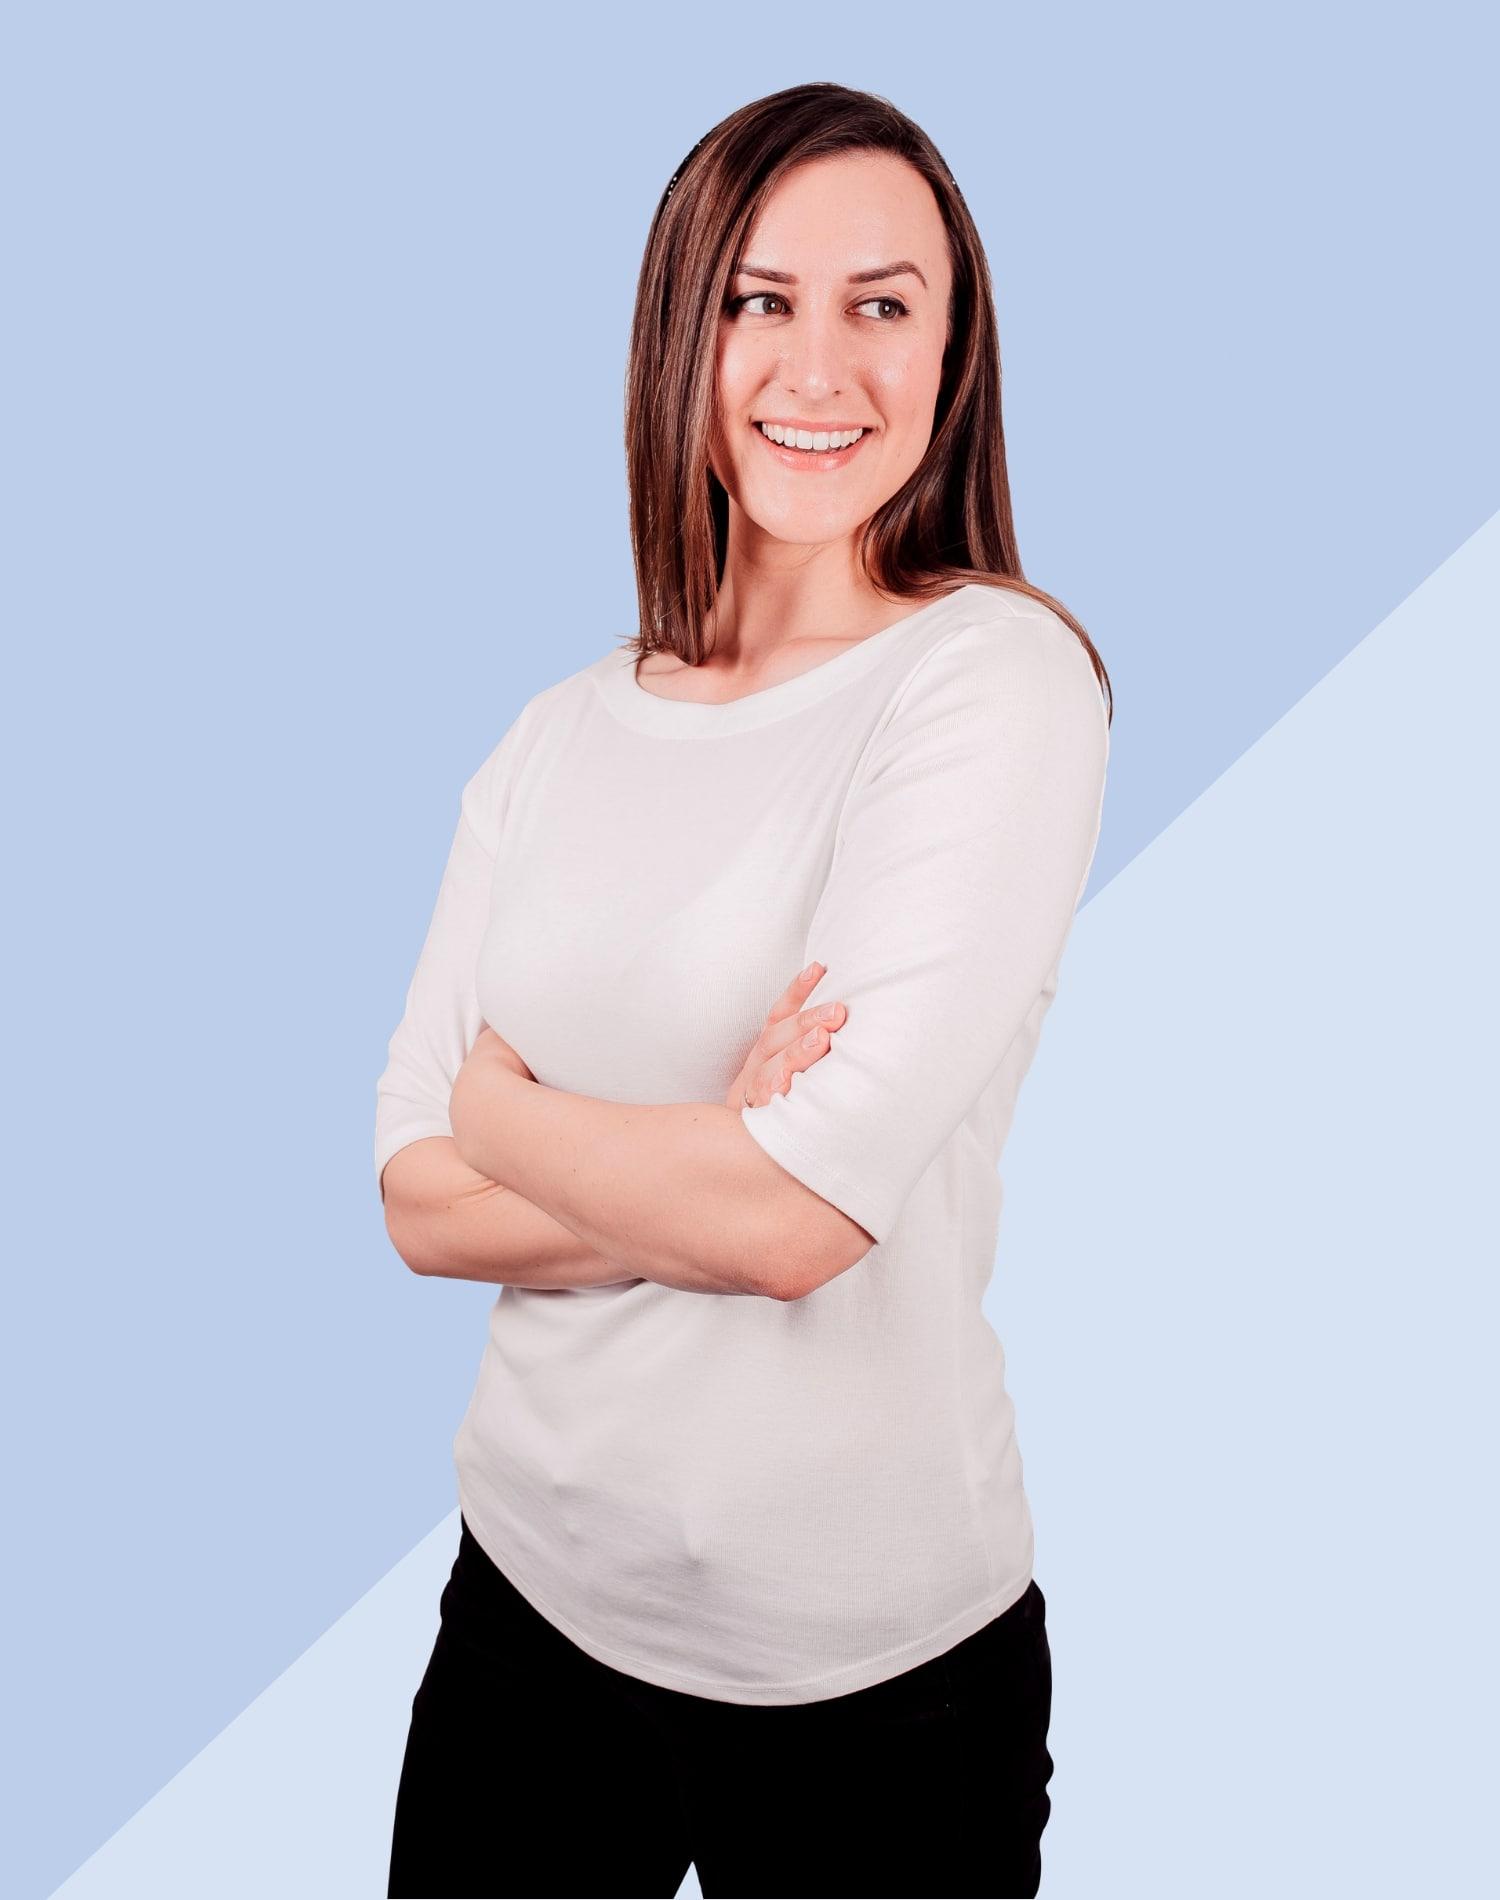 Rae Targos, Dubsado Specialist at Productive Co.